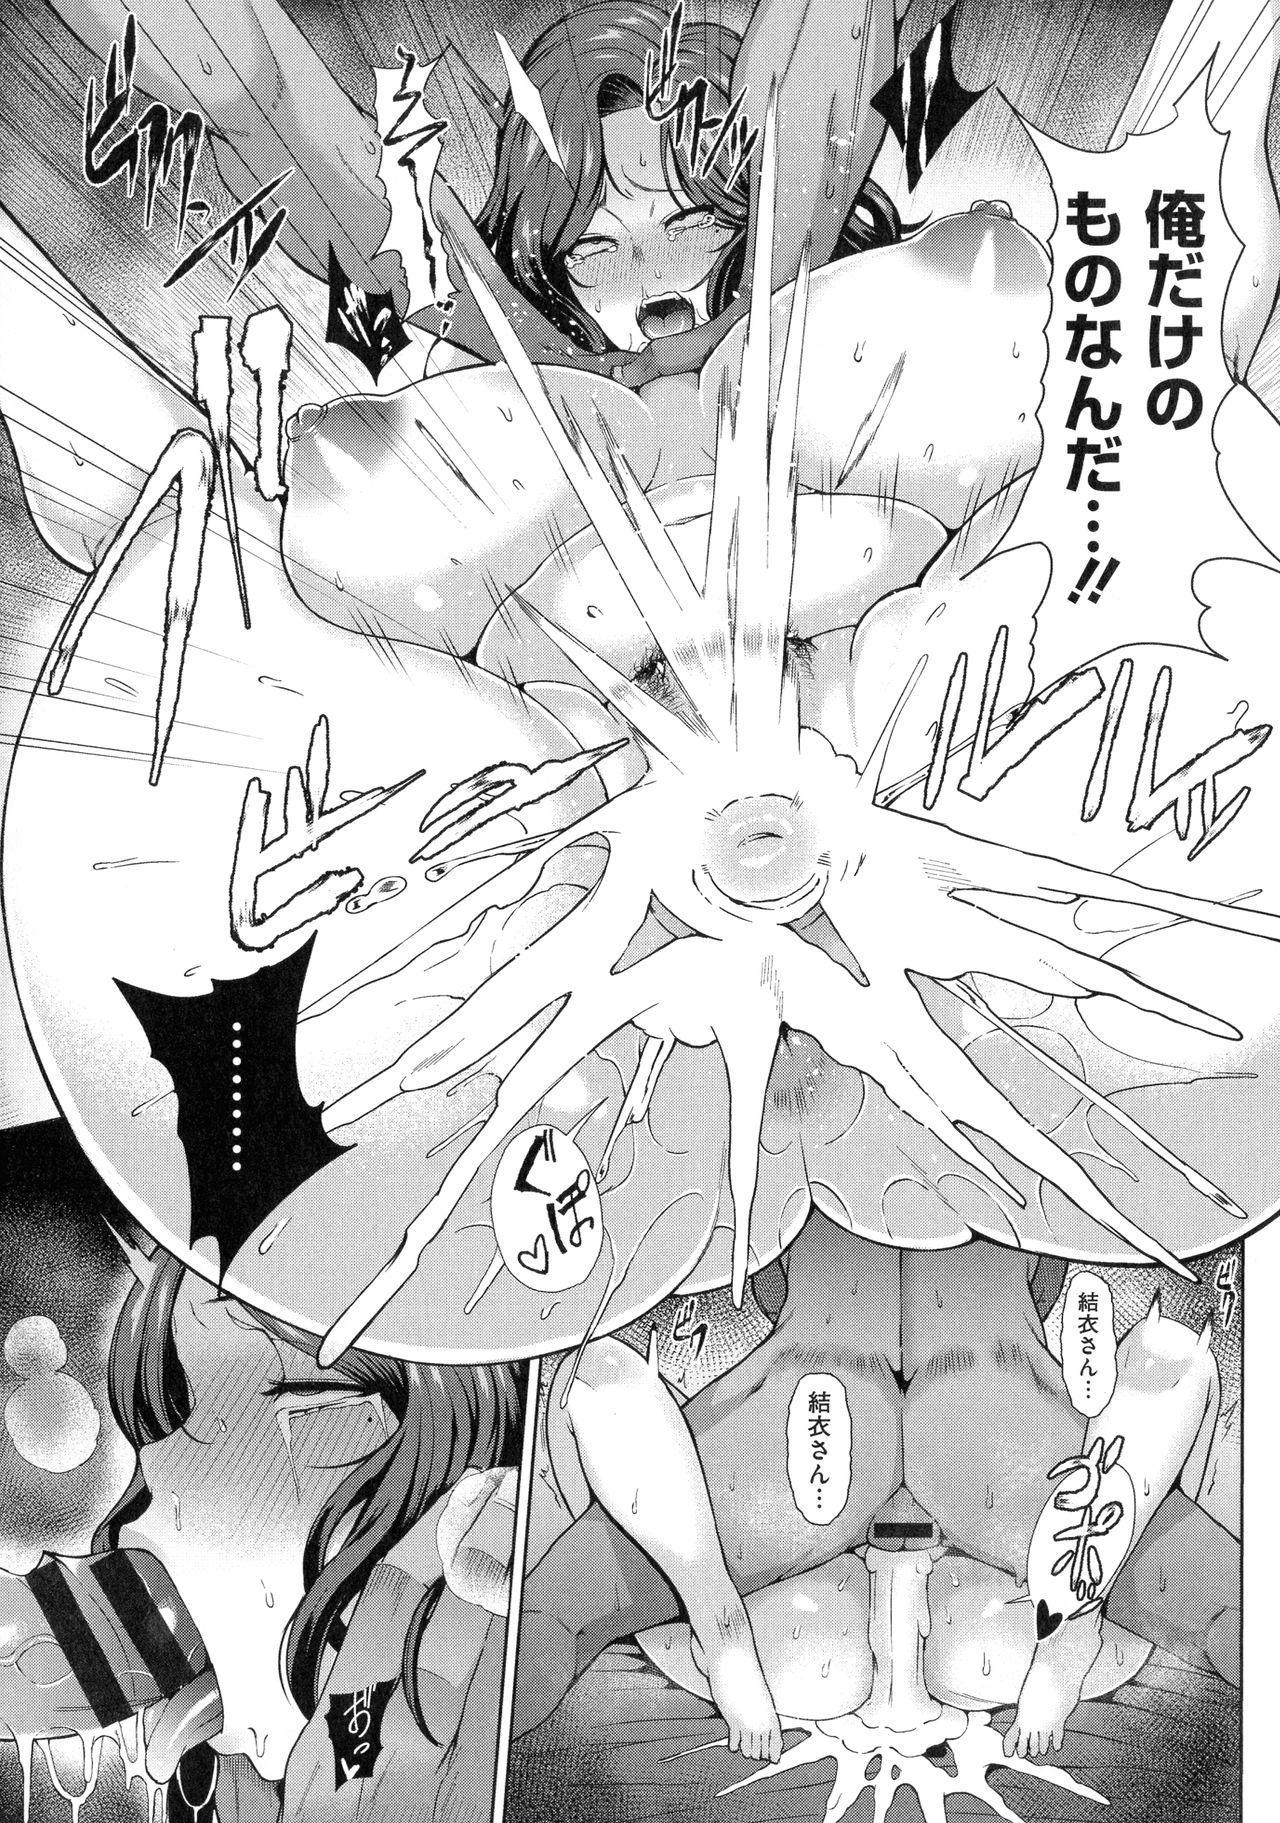 Juku Mesu - Erotic Mature Women 187